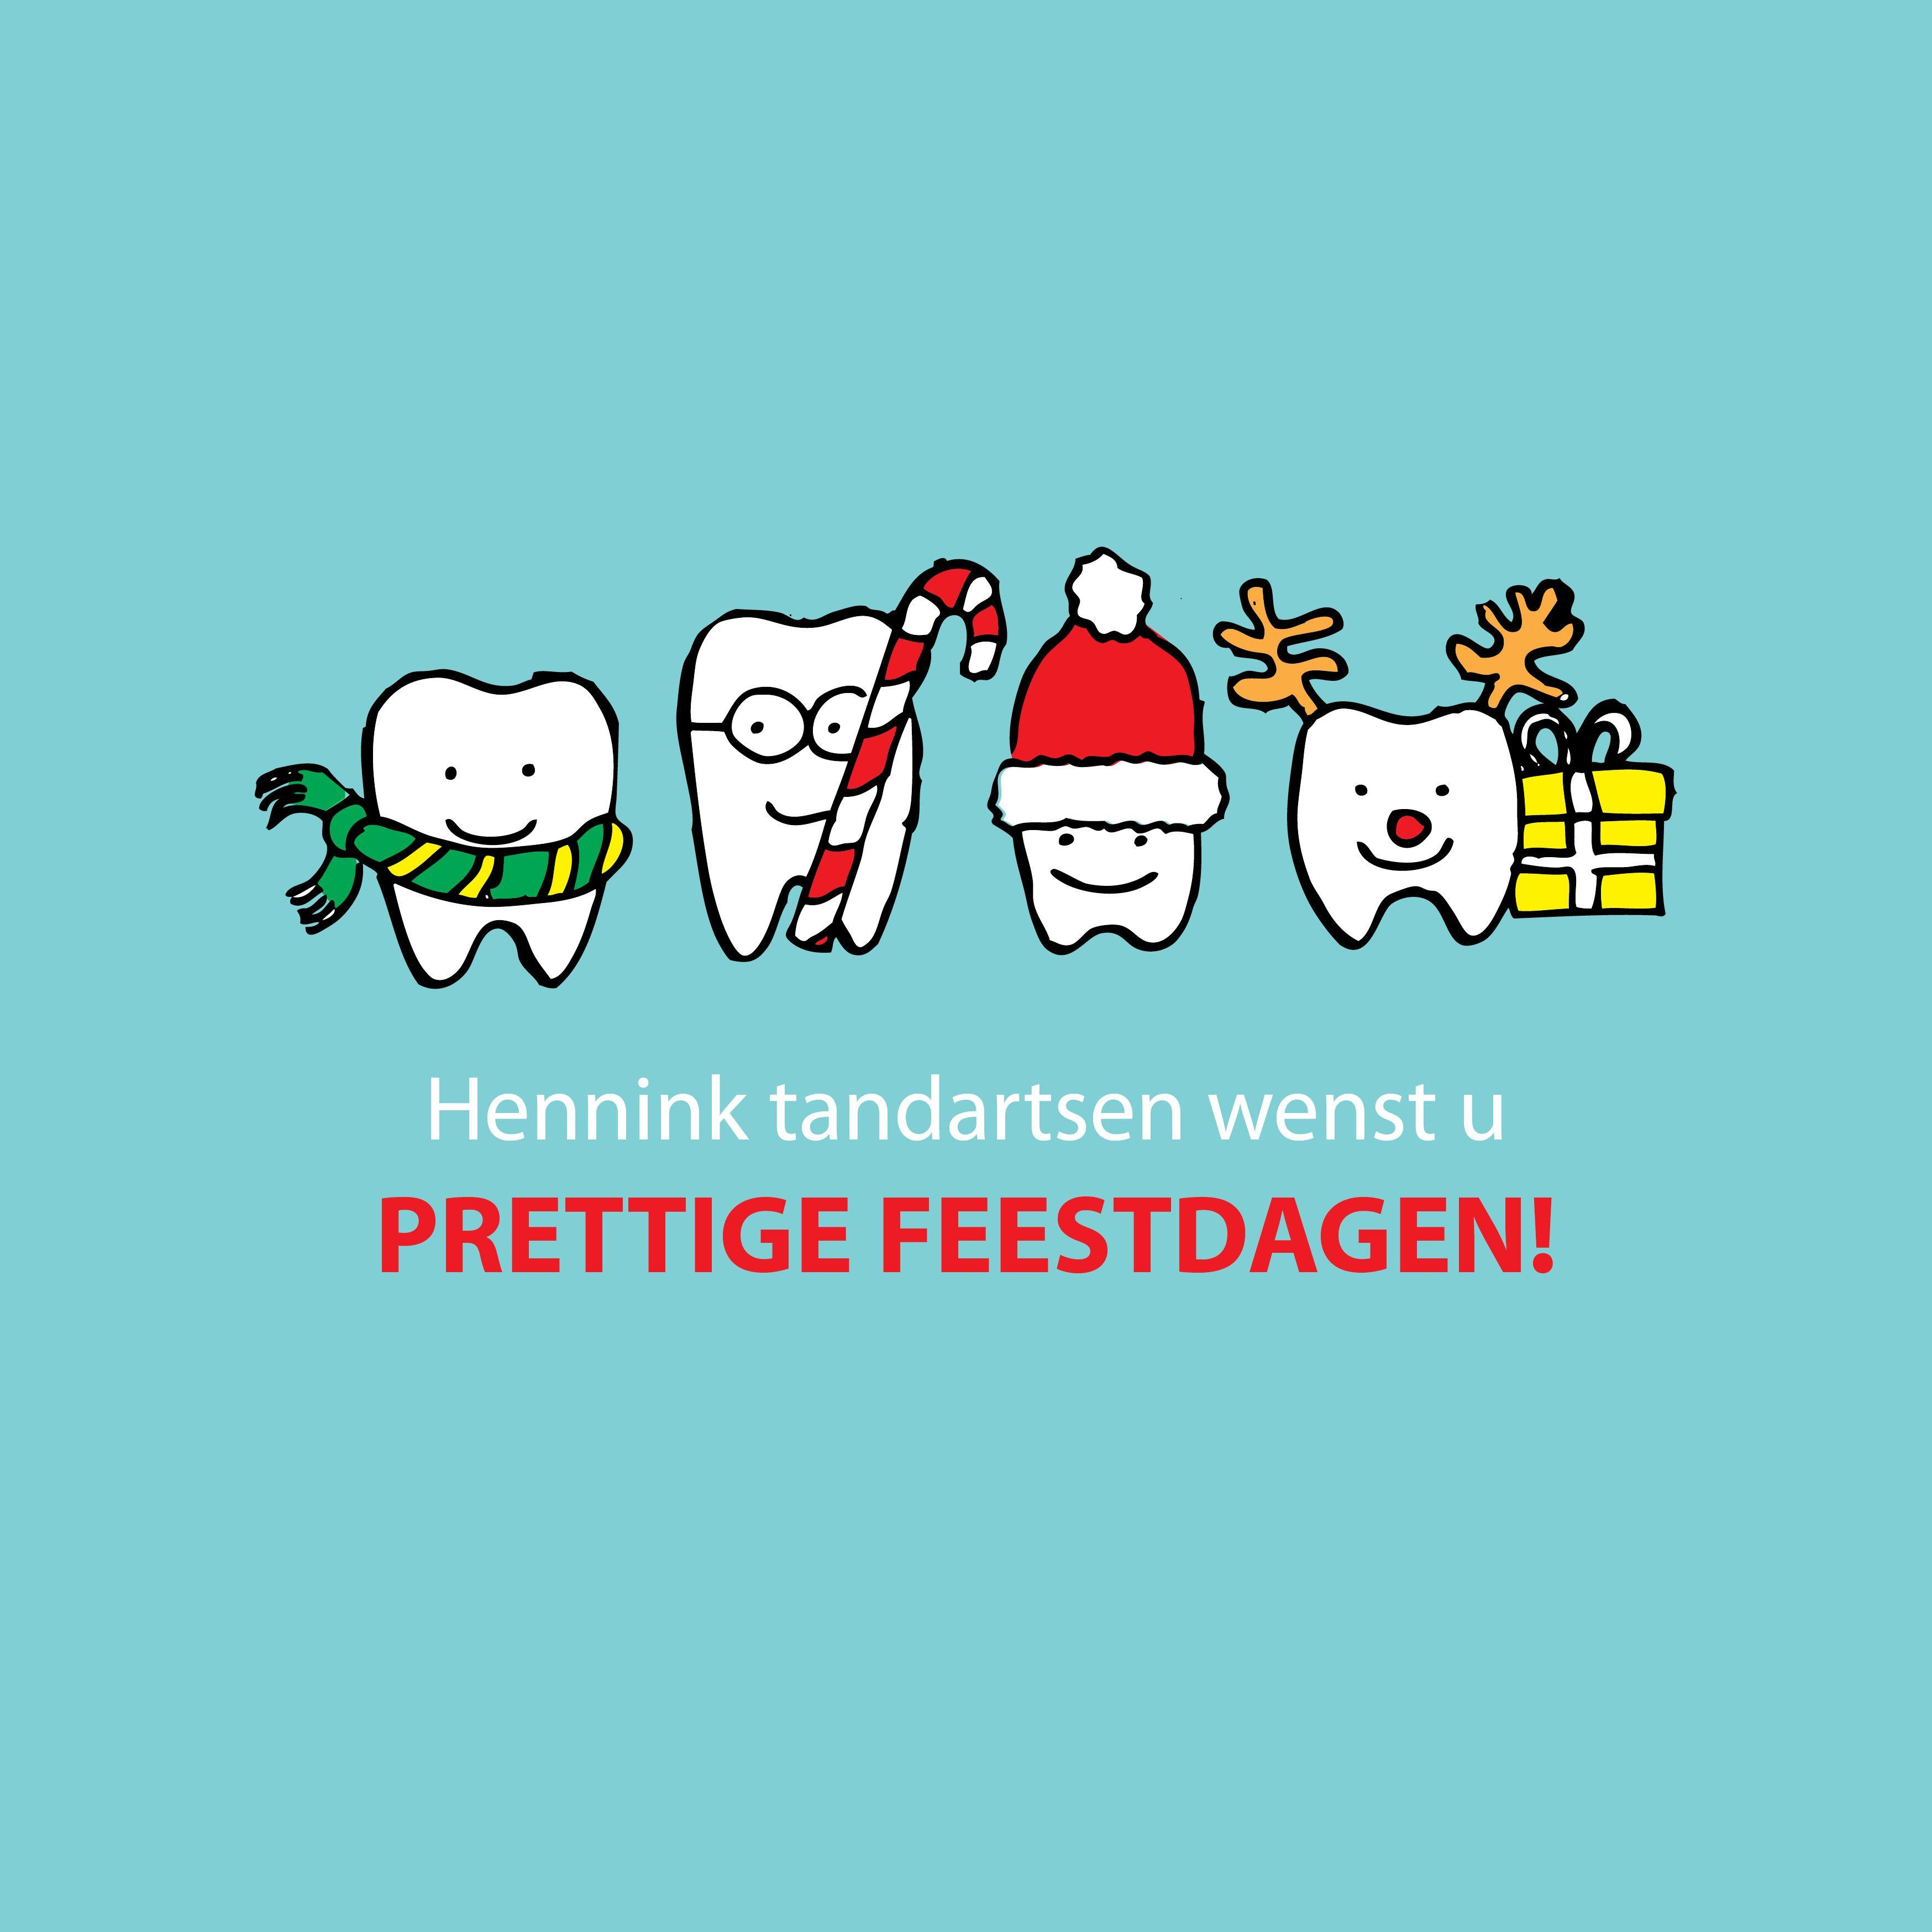 kertskaart Hennink tandartsen christmas card dentist | natal ...